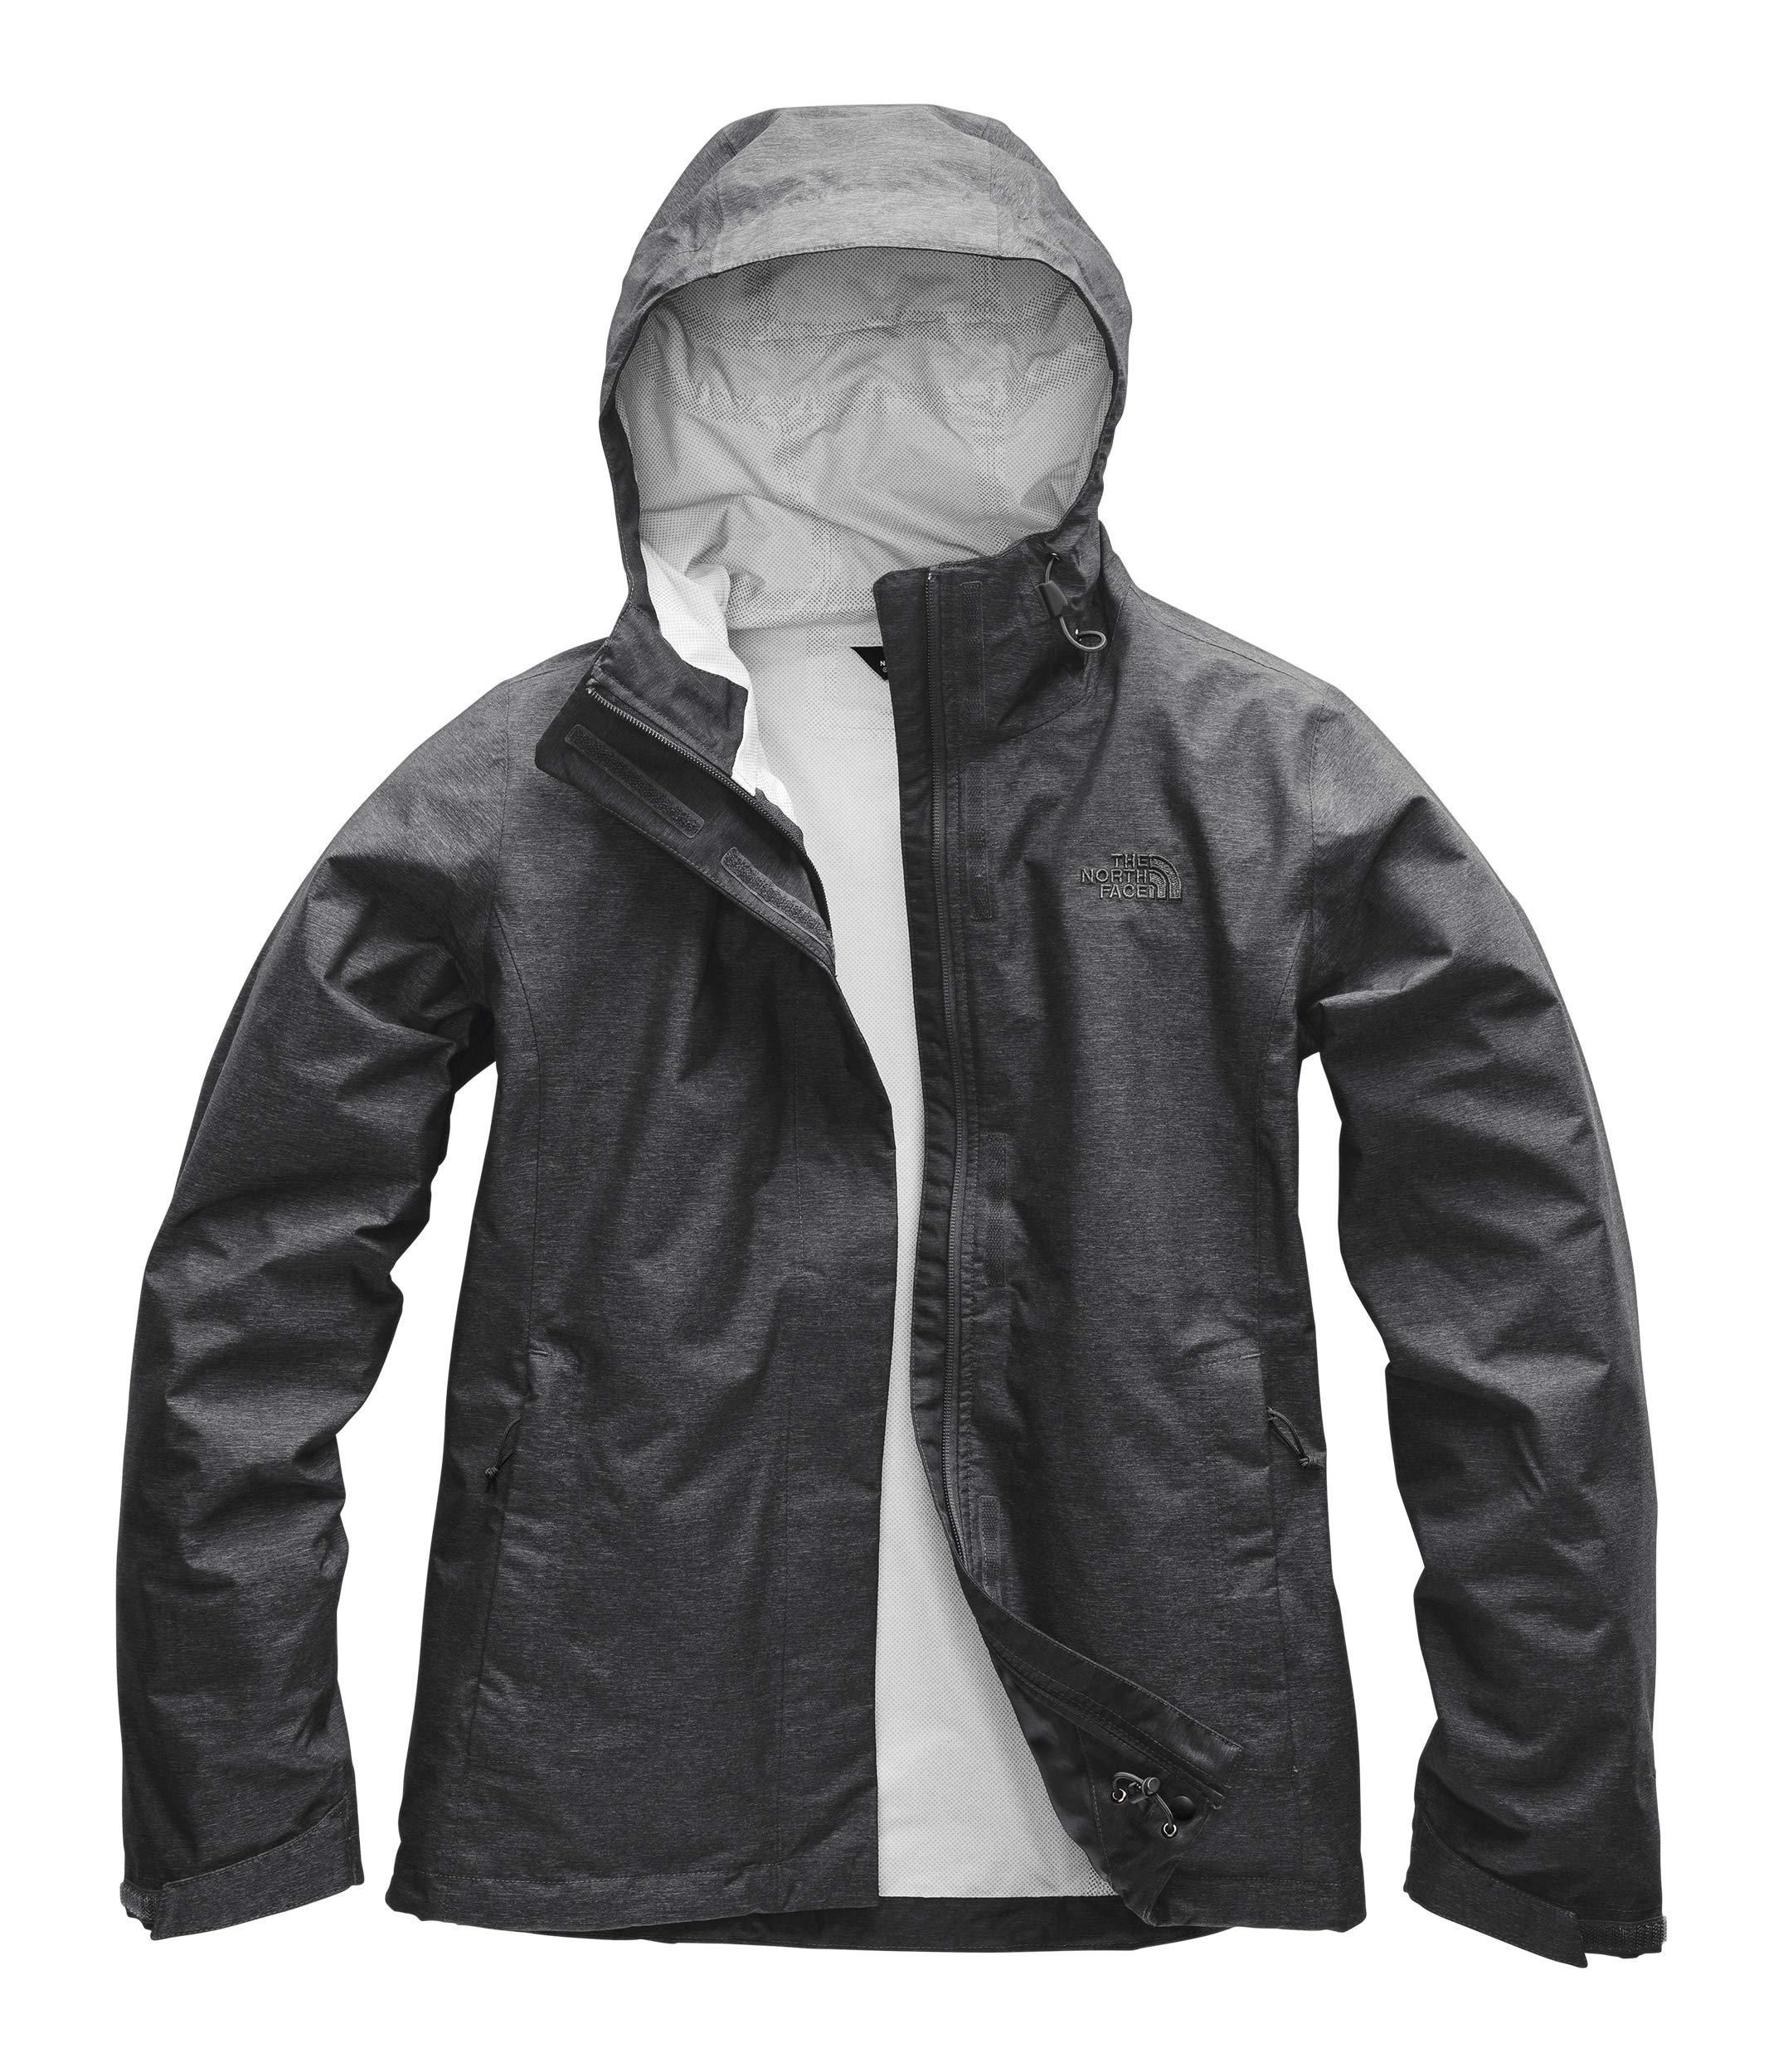 The North Face Women's Venture 2 Jacket, TNF Dark Grey Heather/Asphalt Grey, Size M